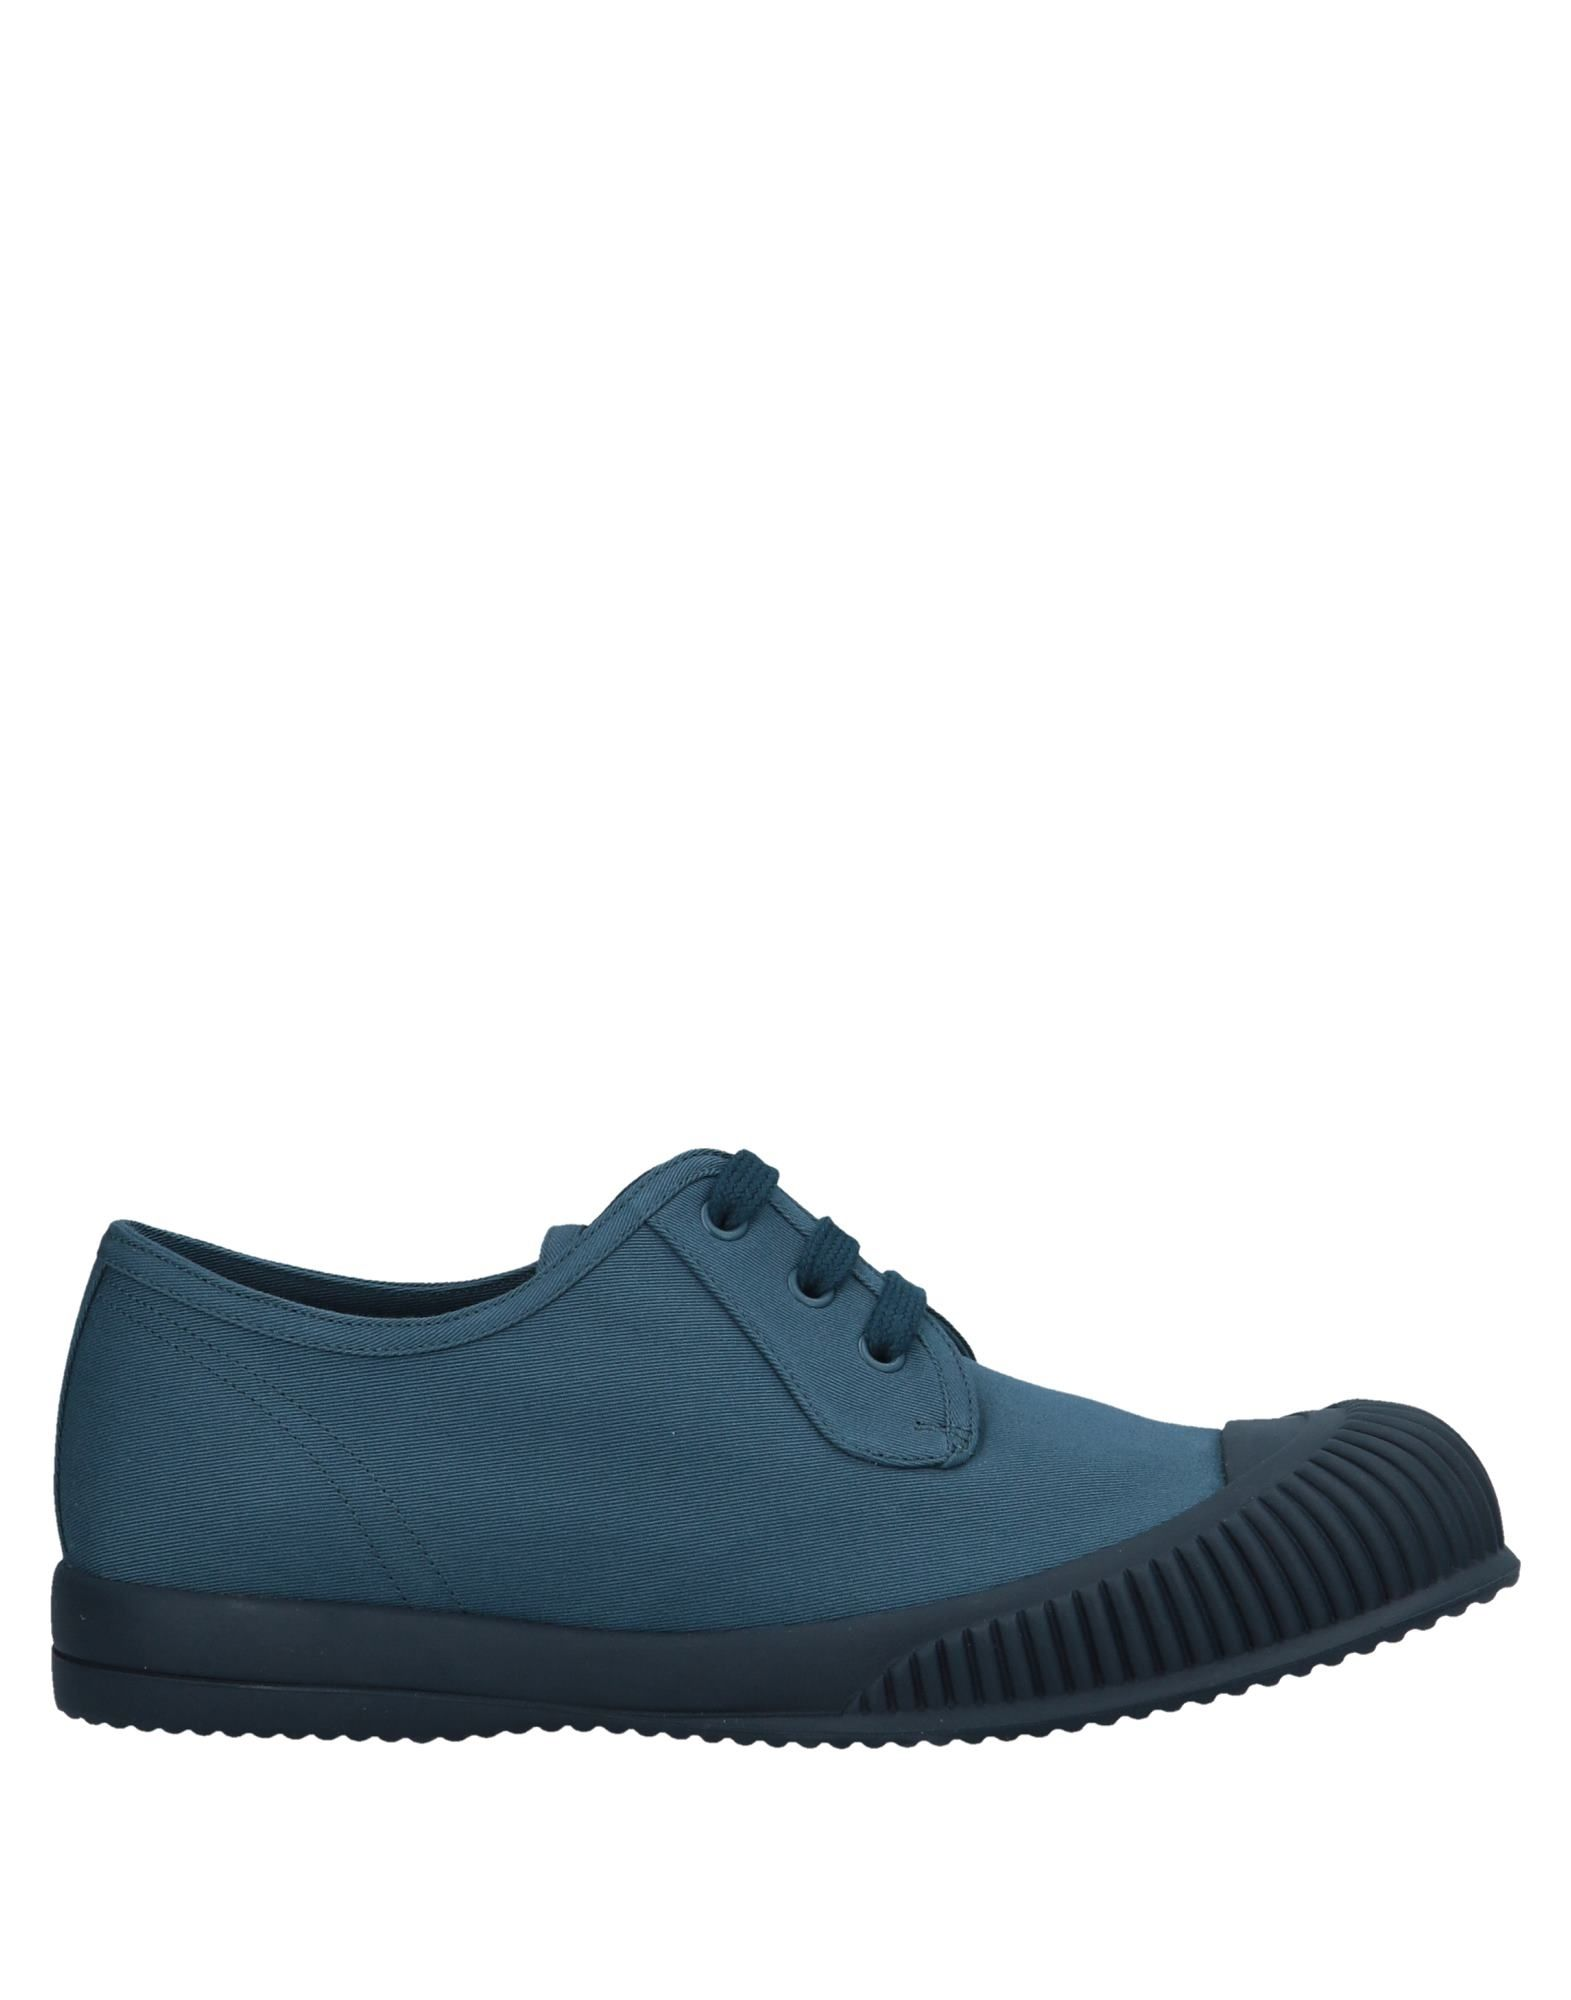 Zapatillas Prada  Sport Hombre - Zapatillas Prada Sport  Prada Azul francés 69a5c9